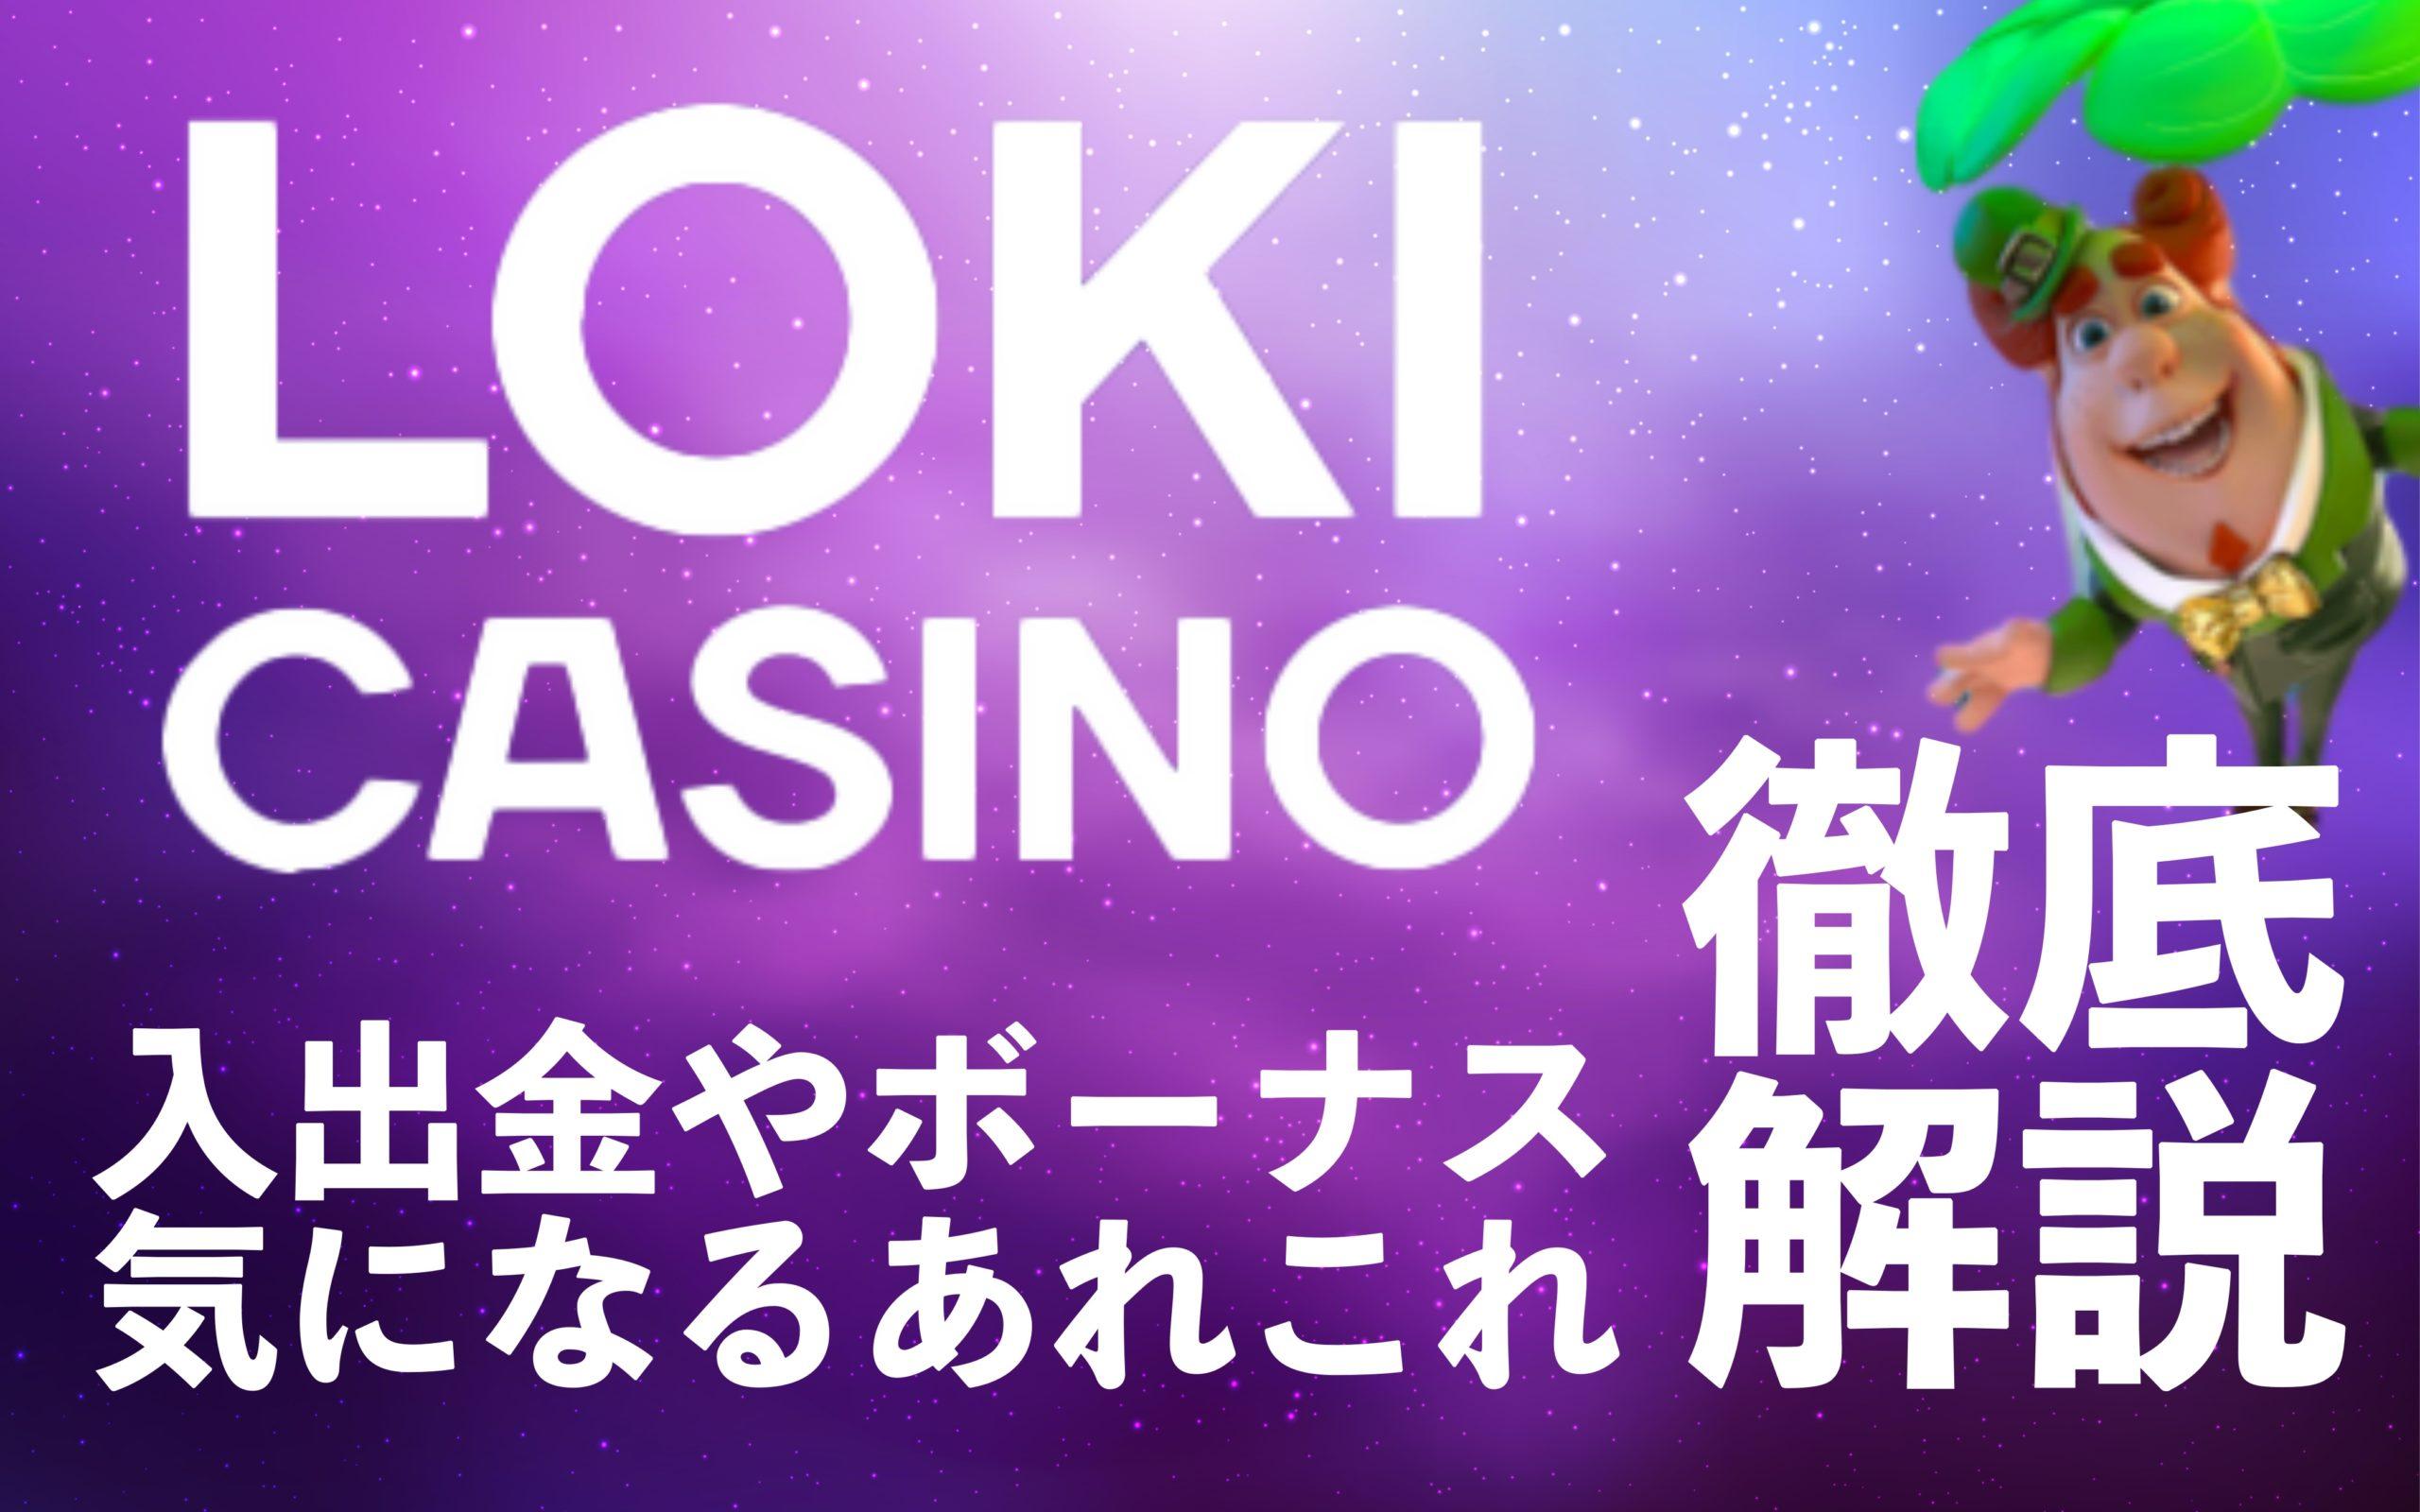 LOKI CASINO(ロキカジノ)の評判、入出金やボーナス、安全性などを徹底解説!